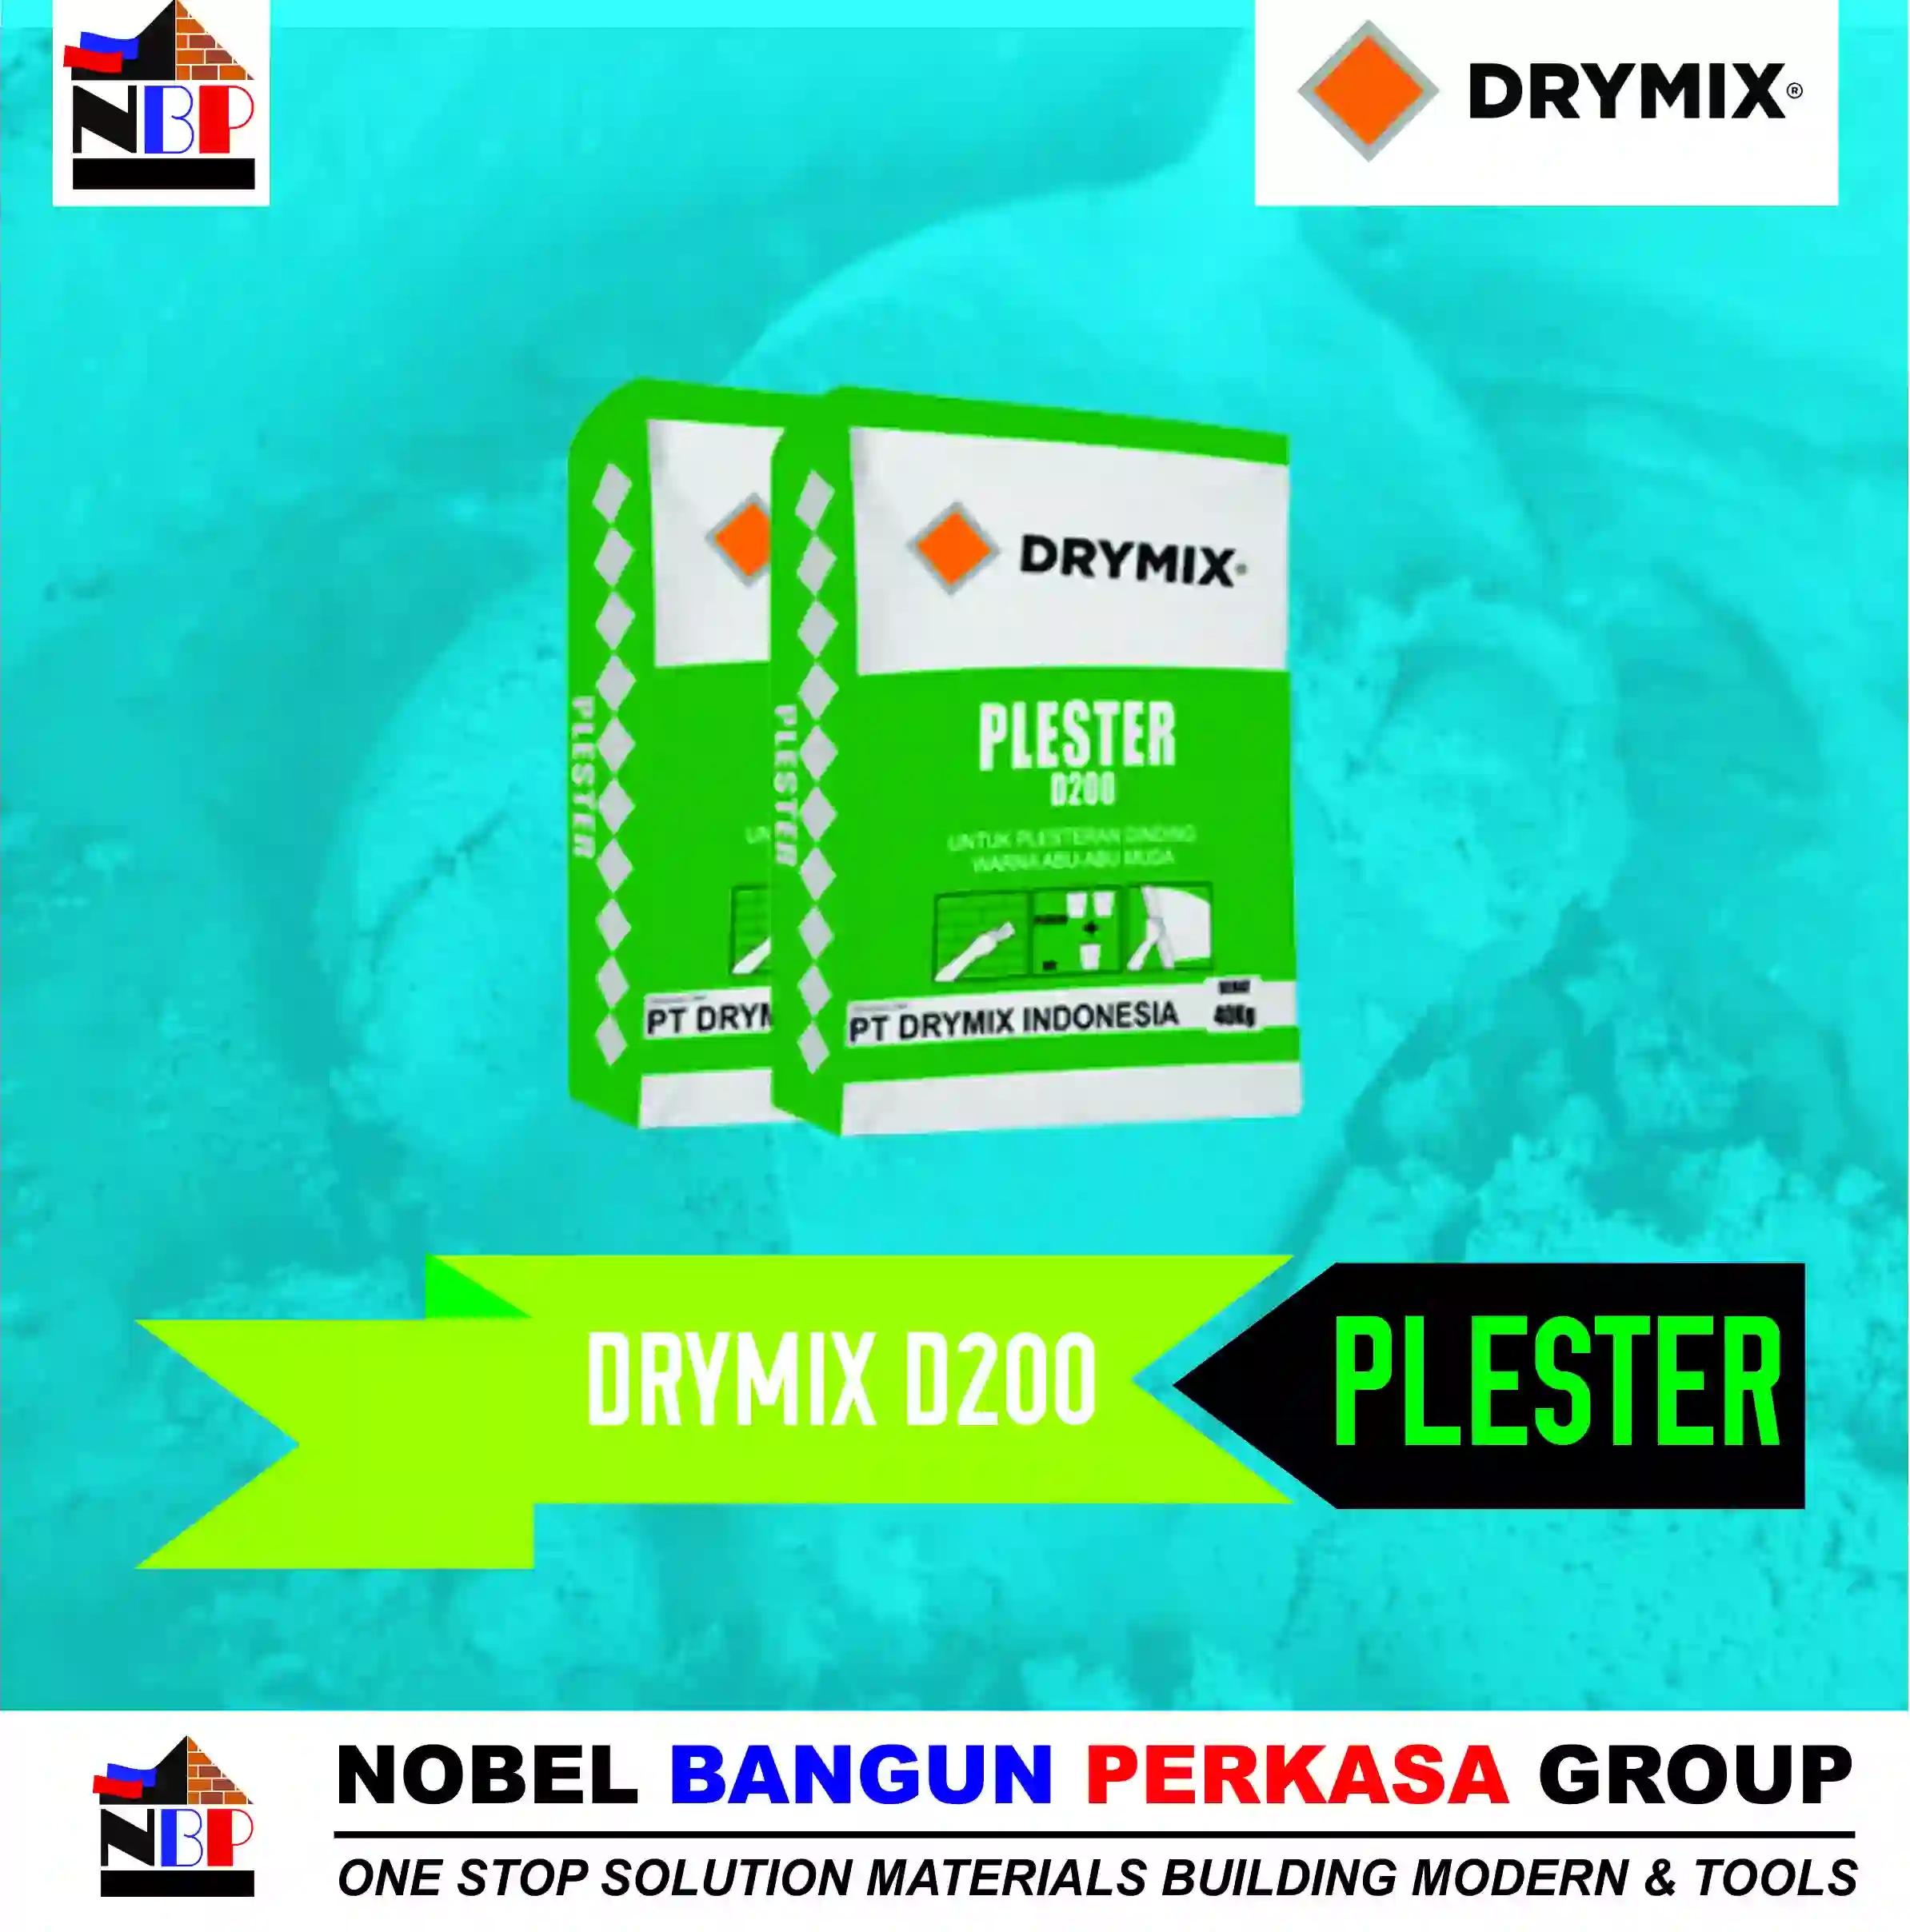 drymix d200 plester